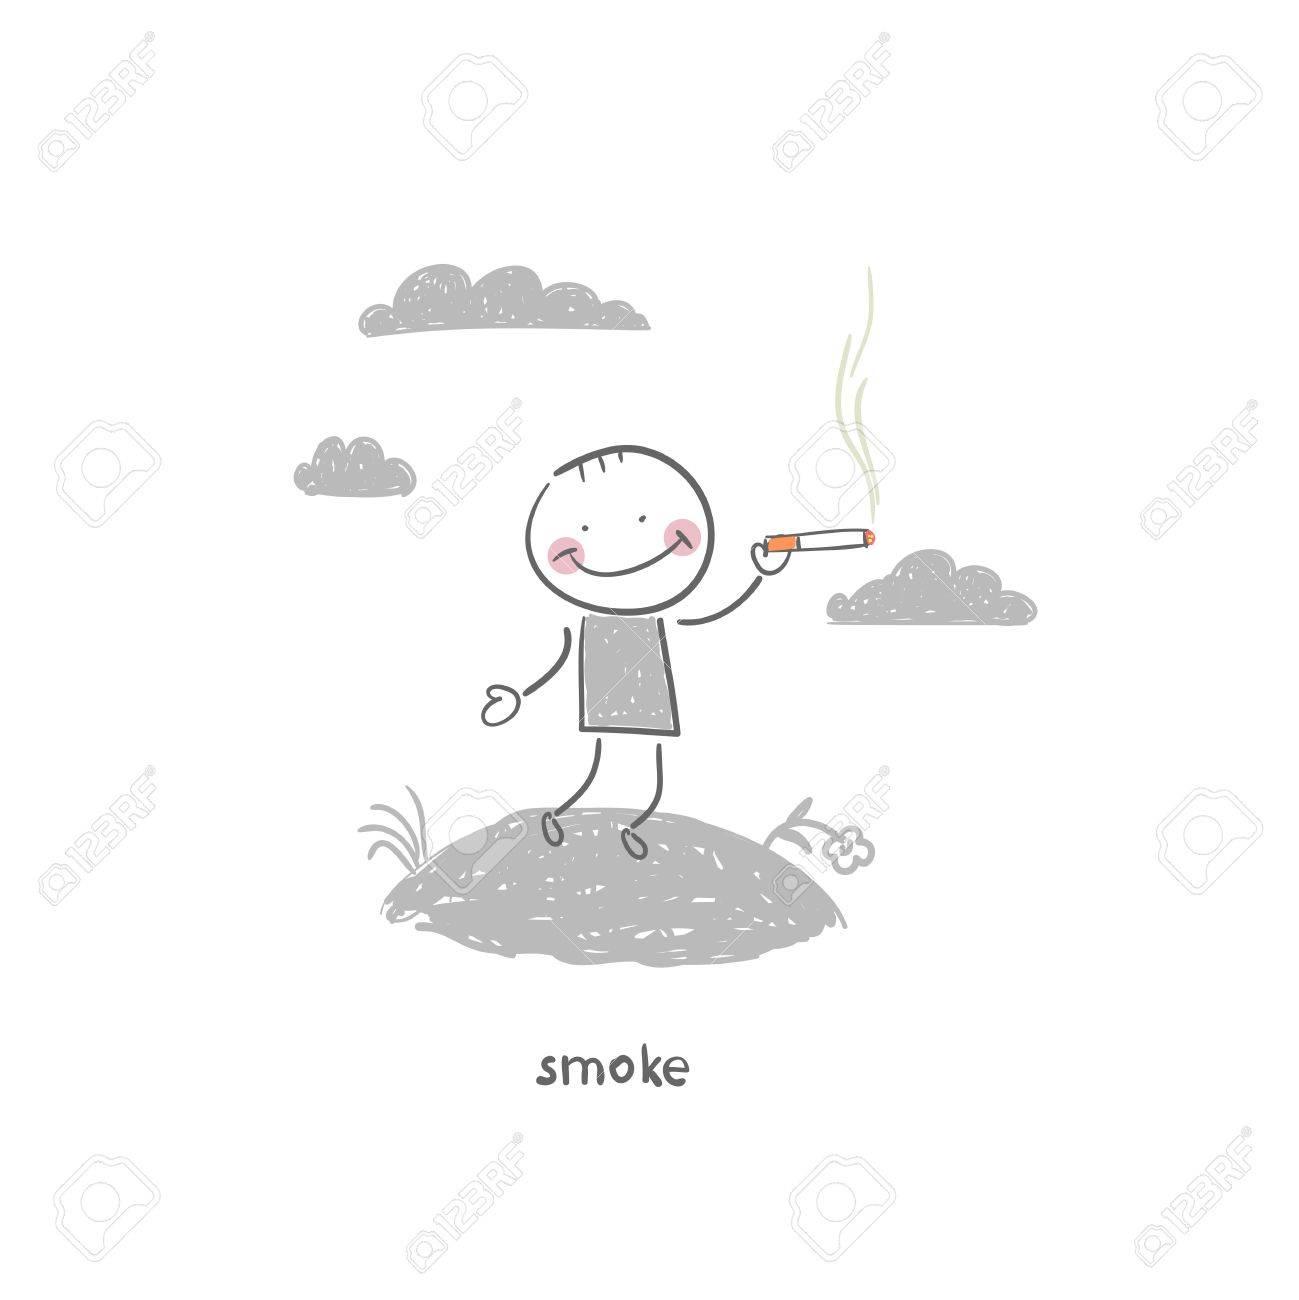 Smoker. Illustration. Stock Vector - 18035551